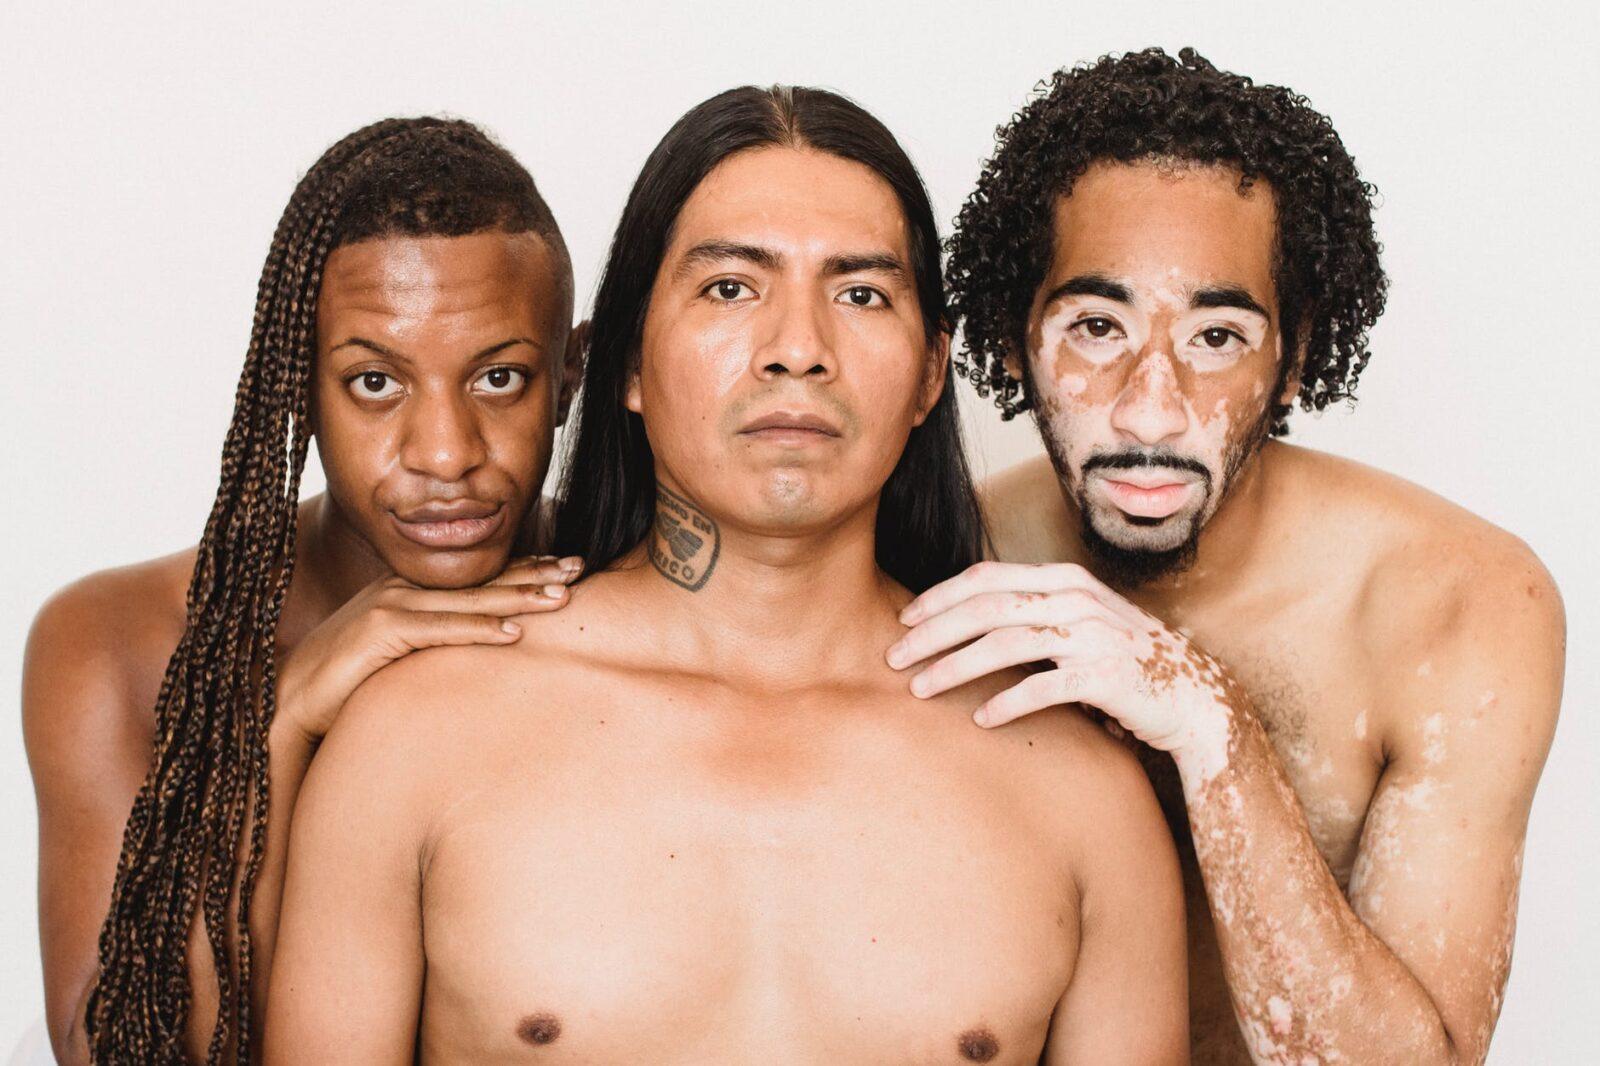 feminine diverse shirtless men on white background